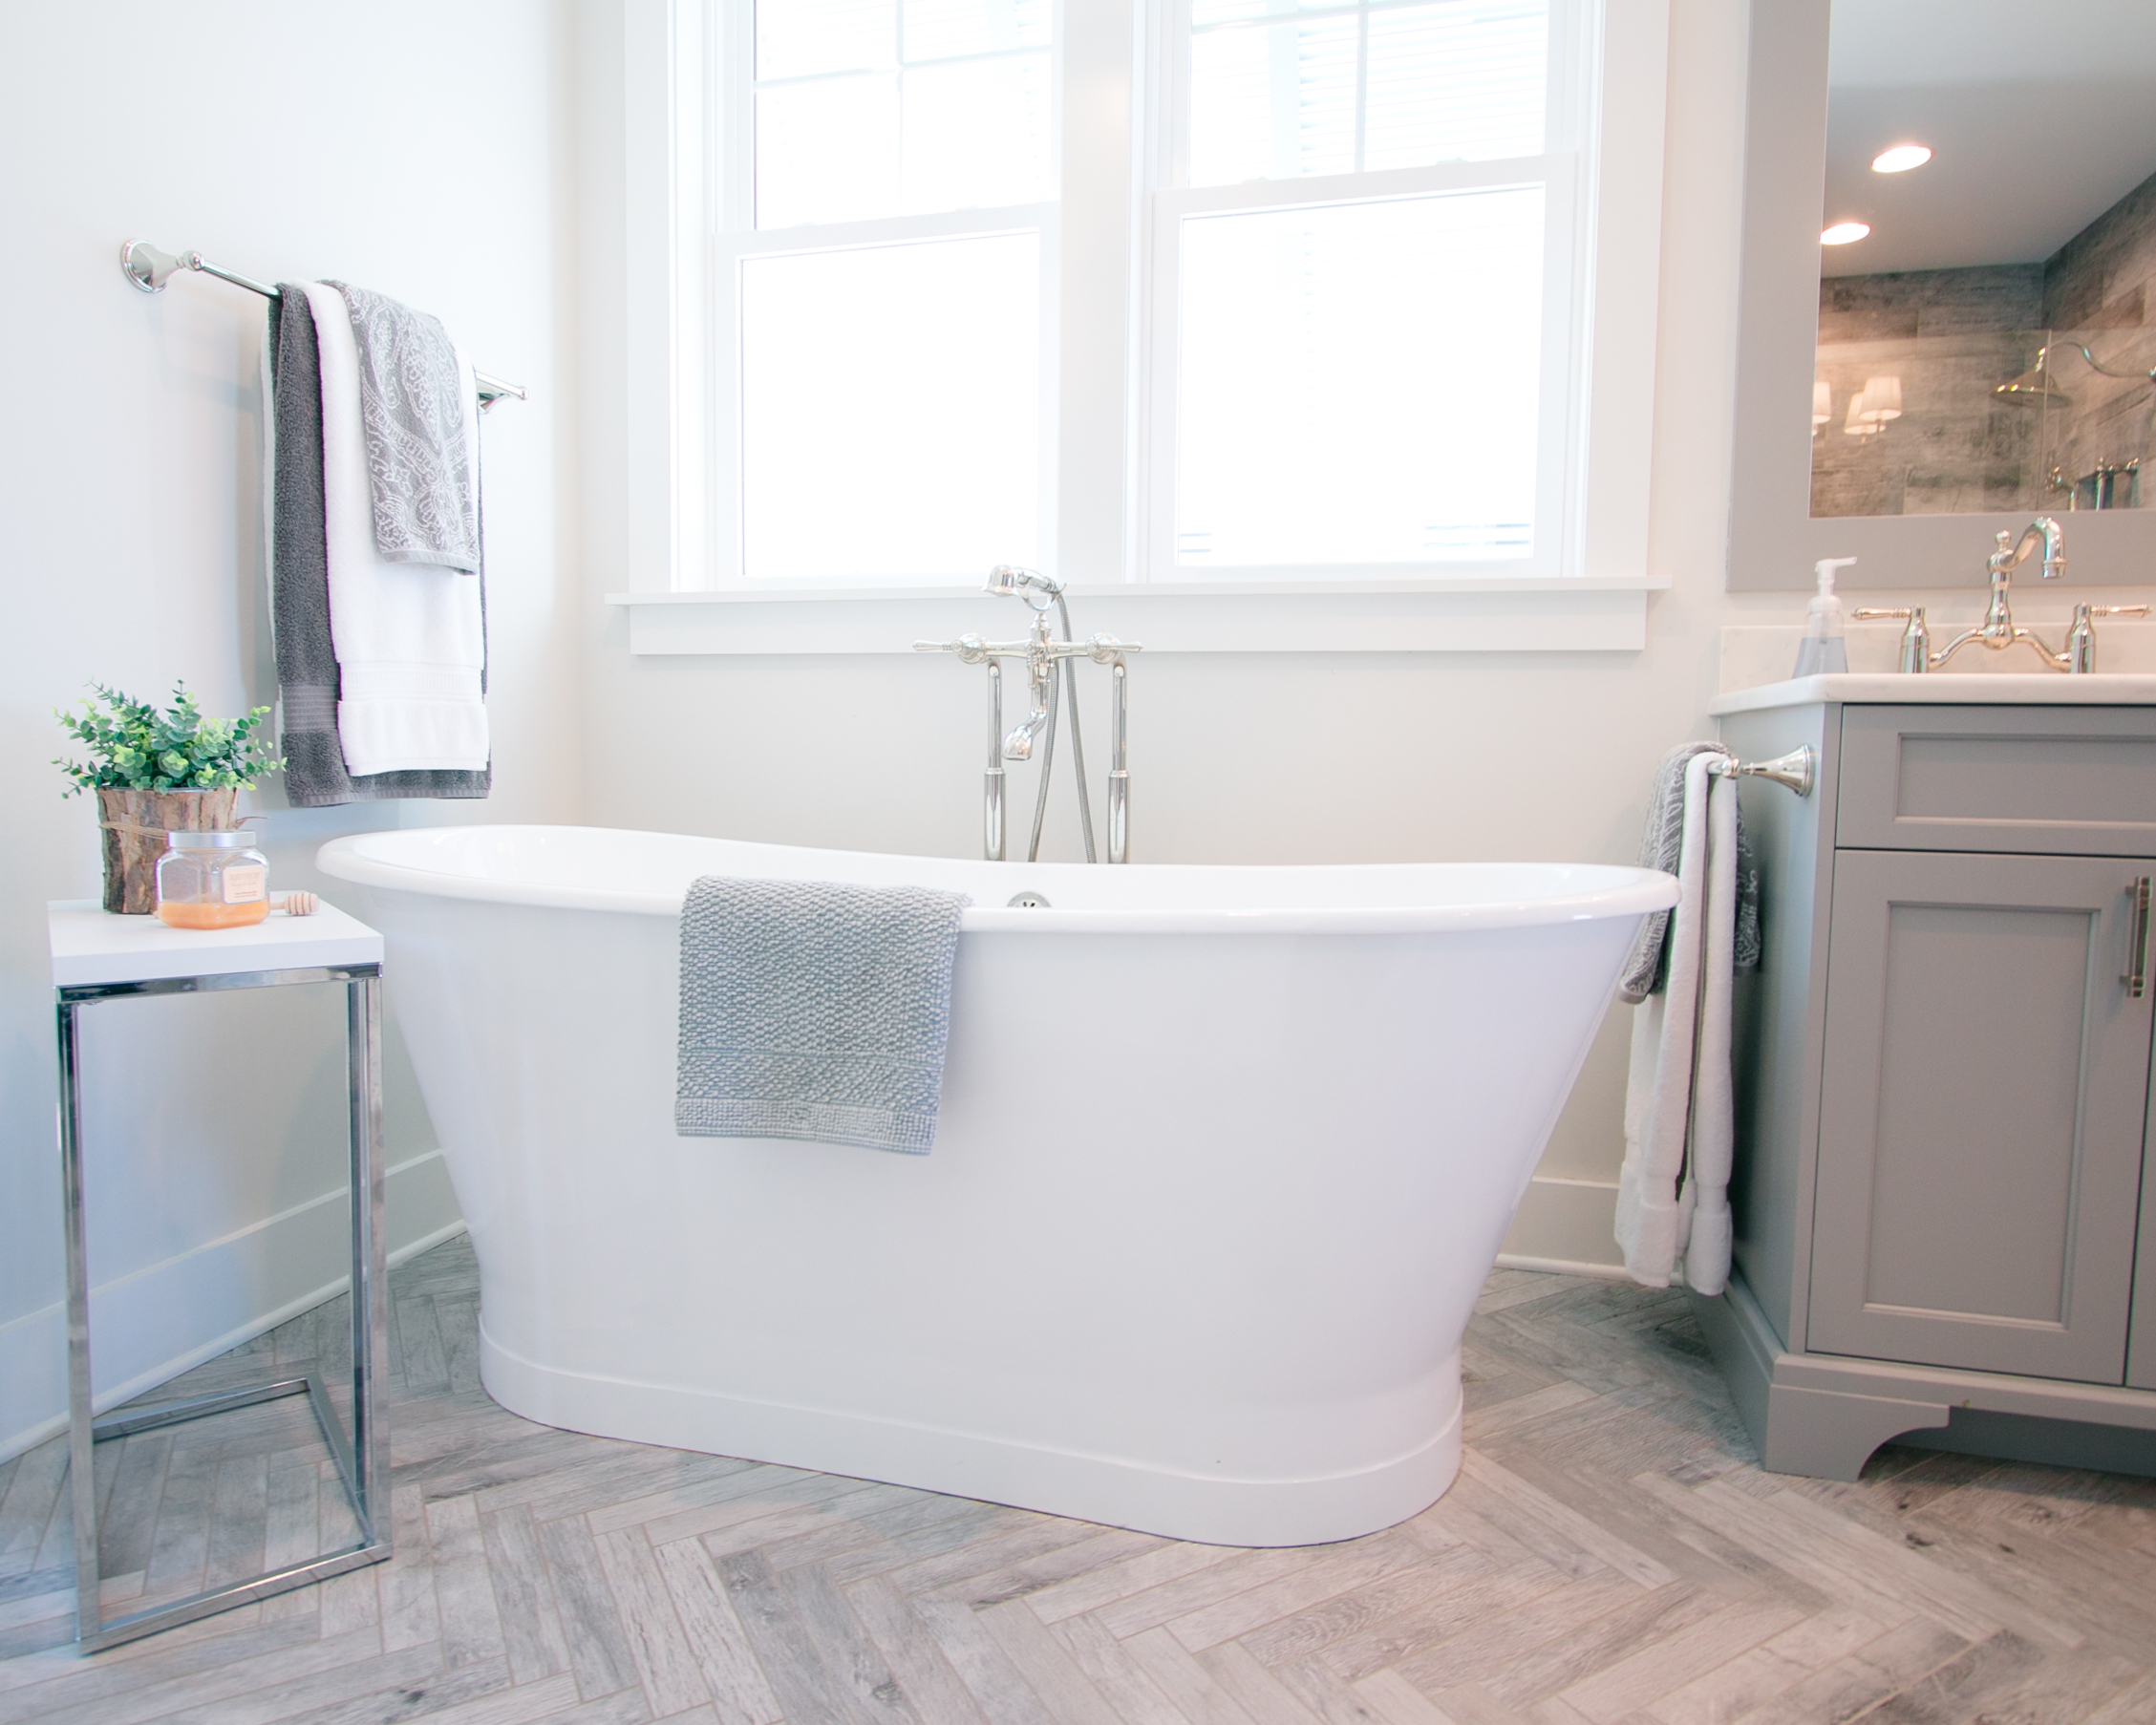 spacious master bath with soaking tub